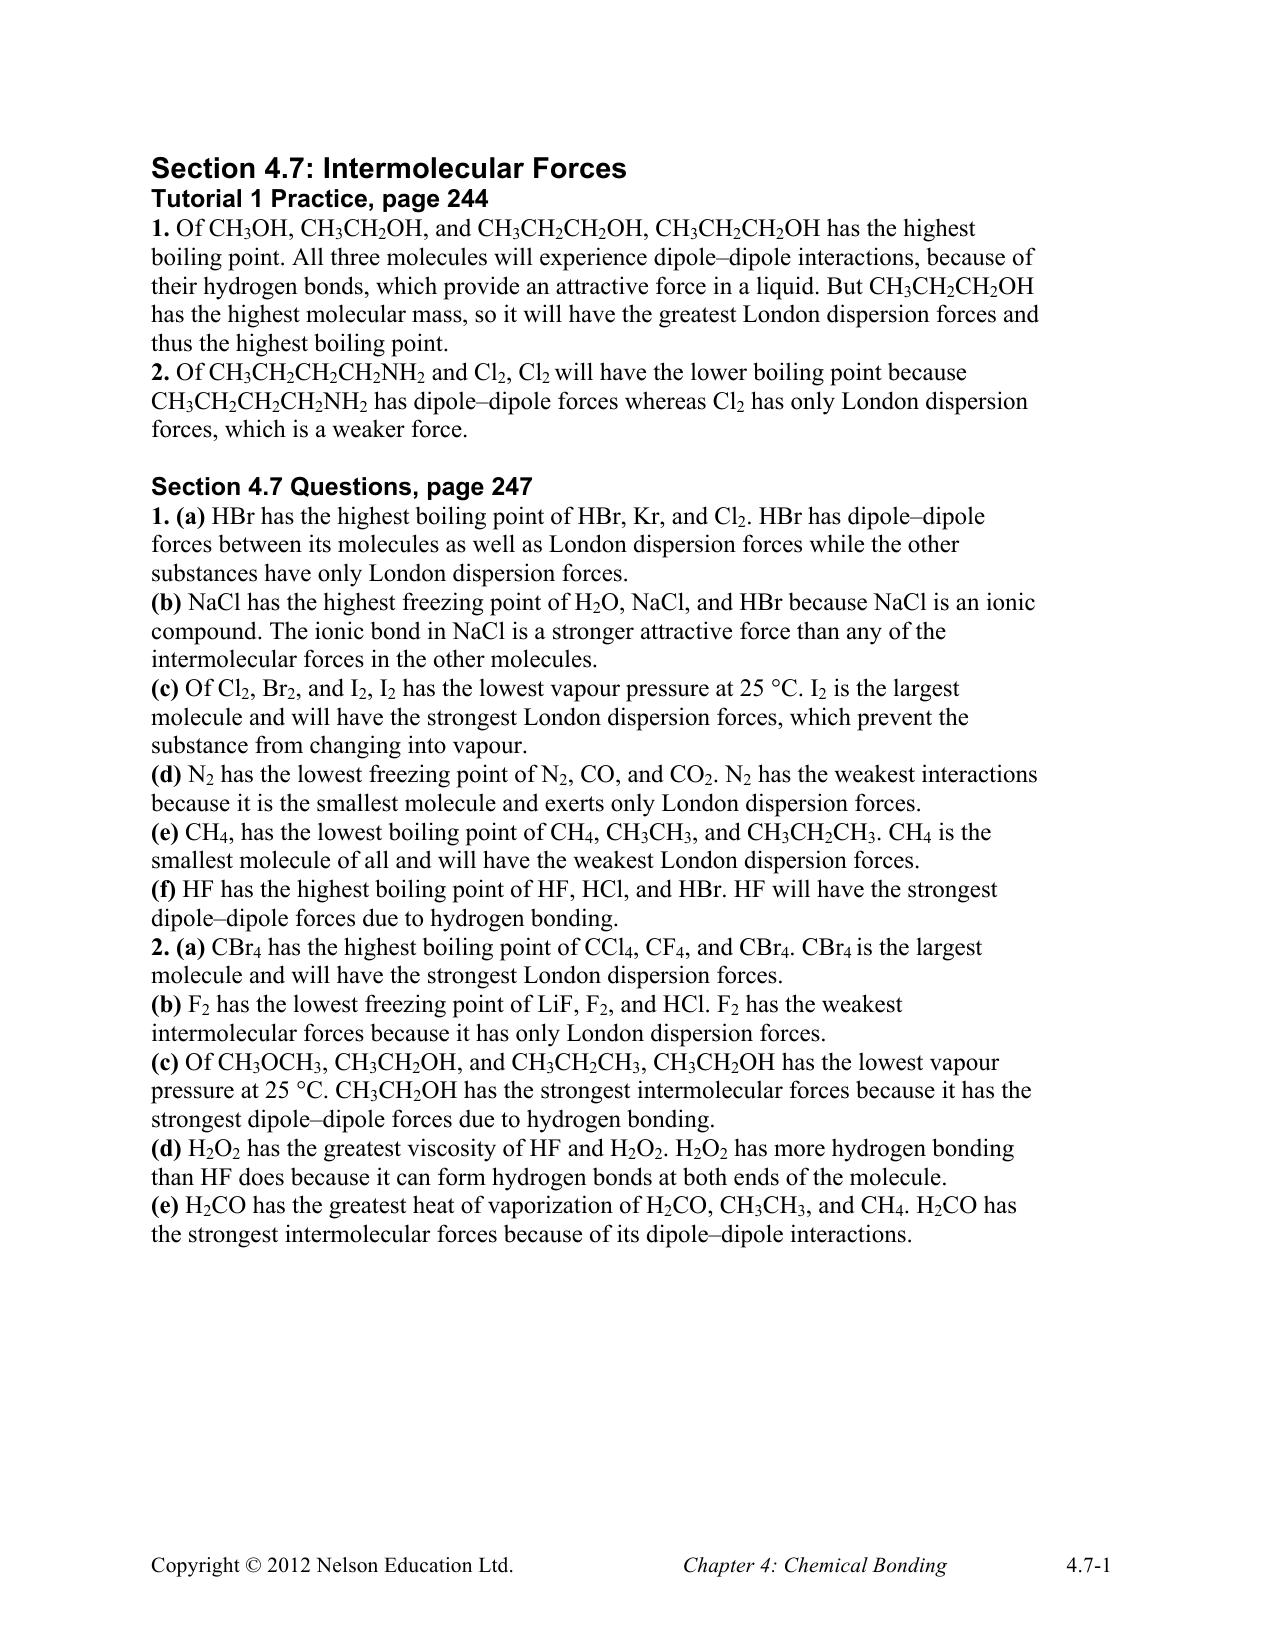 Section 4 7: Intermolecular Forces